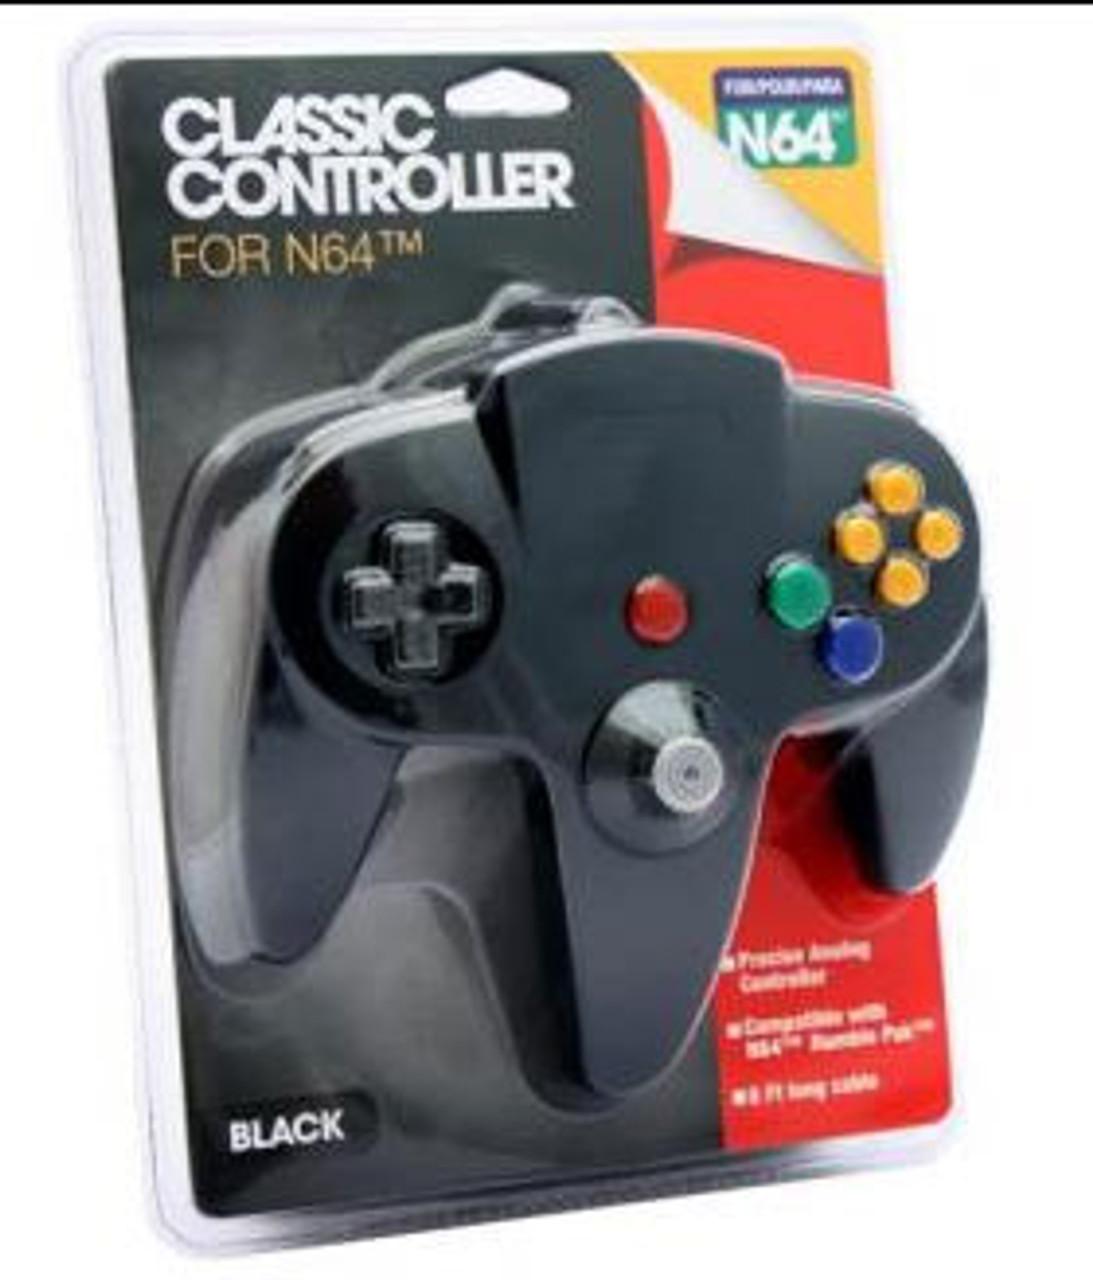 Nintendo Classic Controller for N64 [Black]